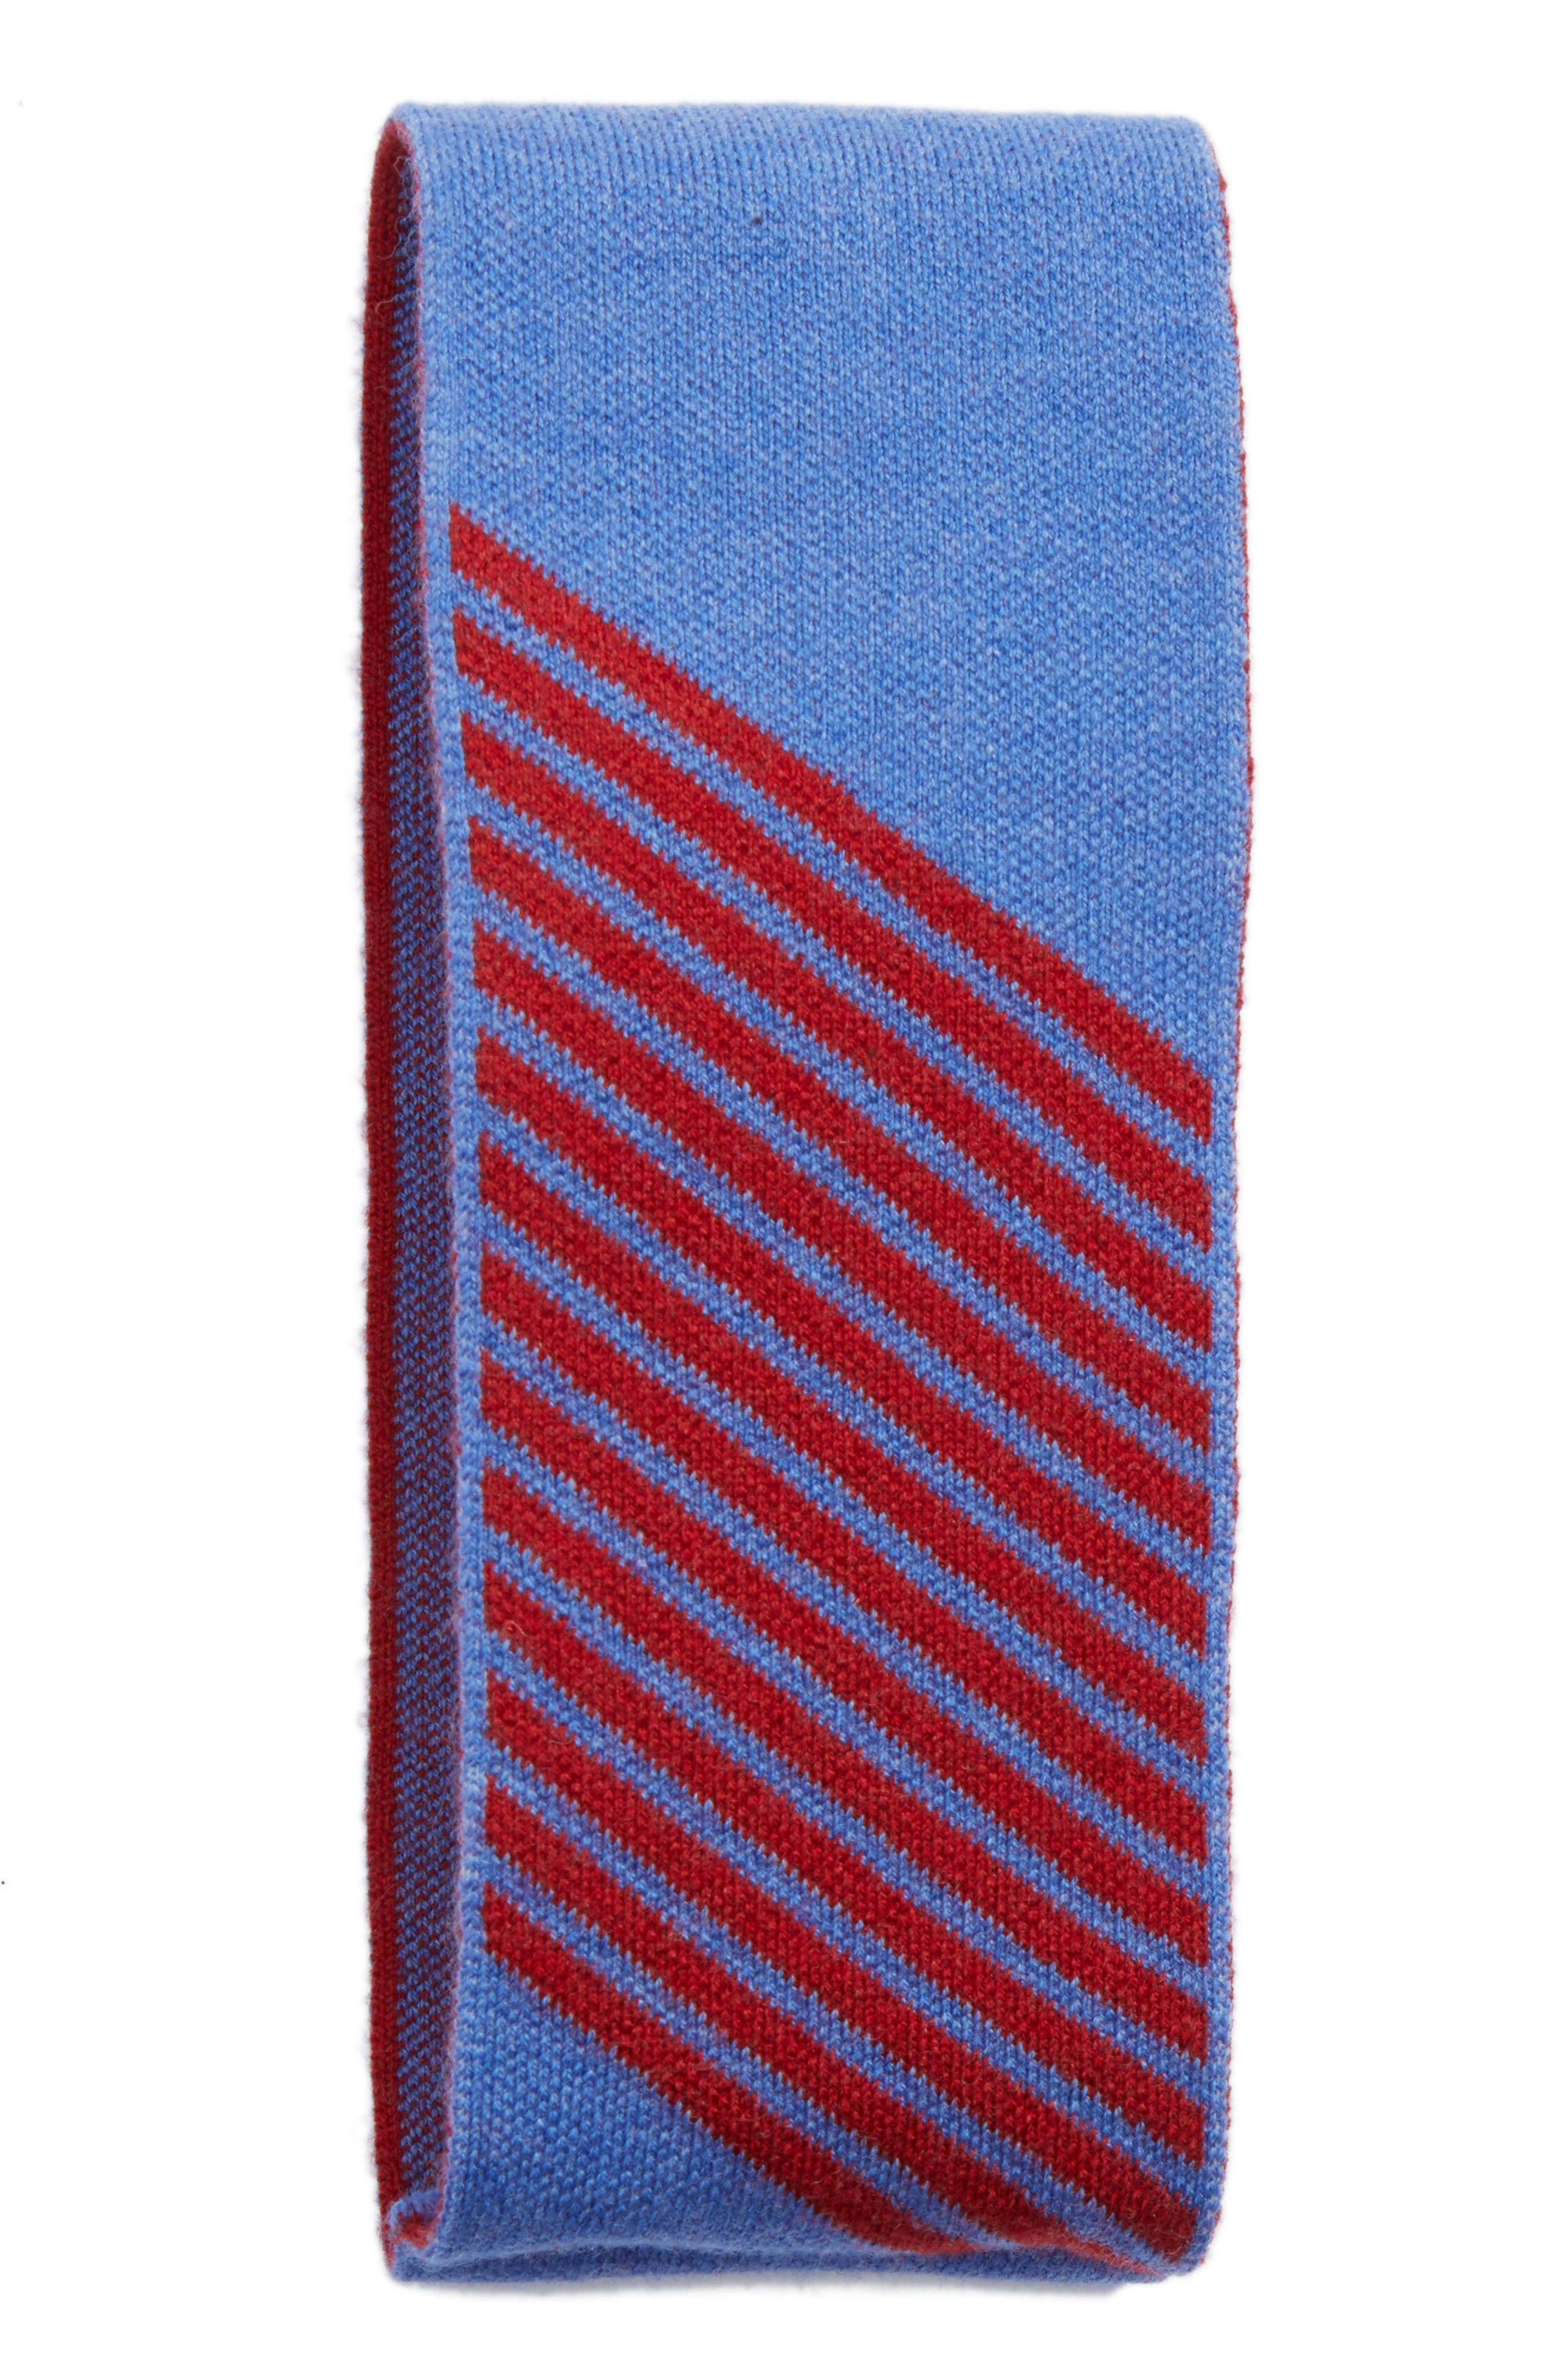 Tubulor Knit Headband,                             Main thumbnail 1, color,                             400